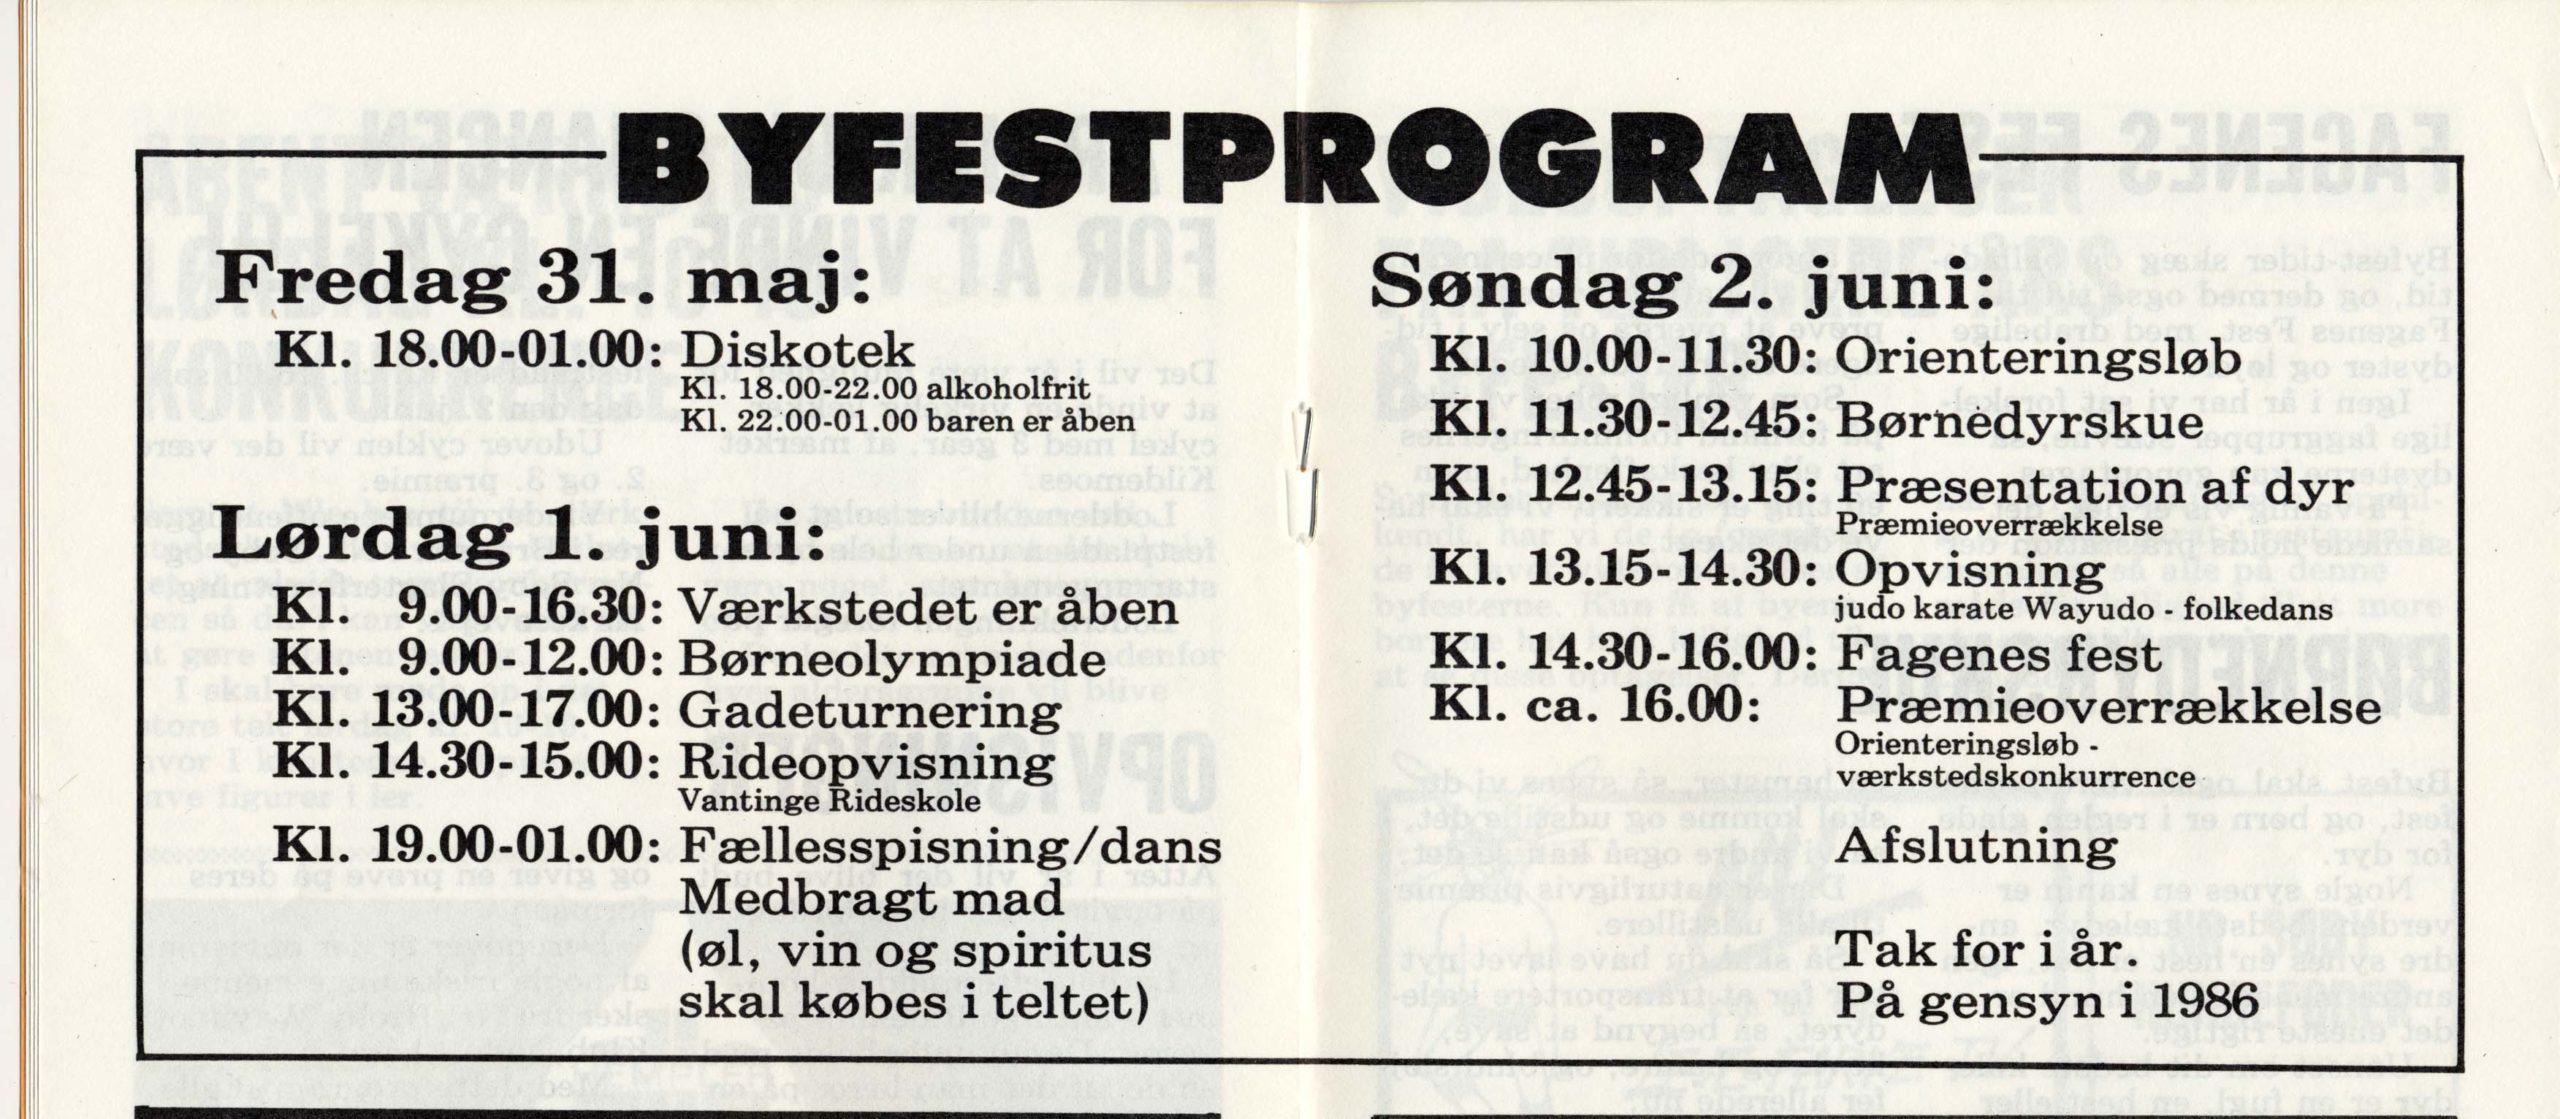 Program 1985